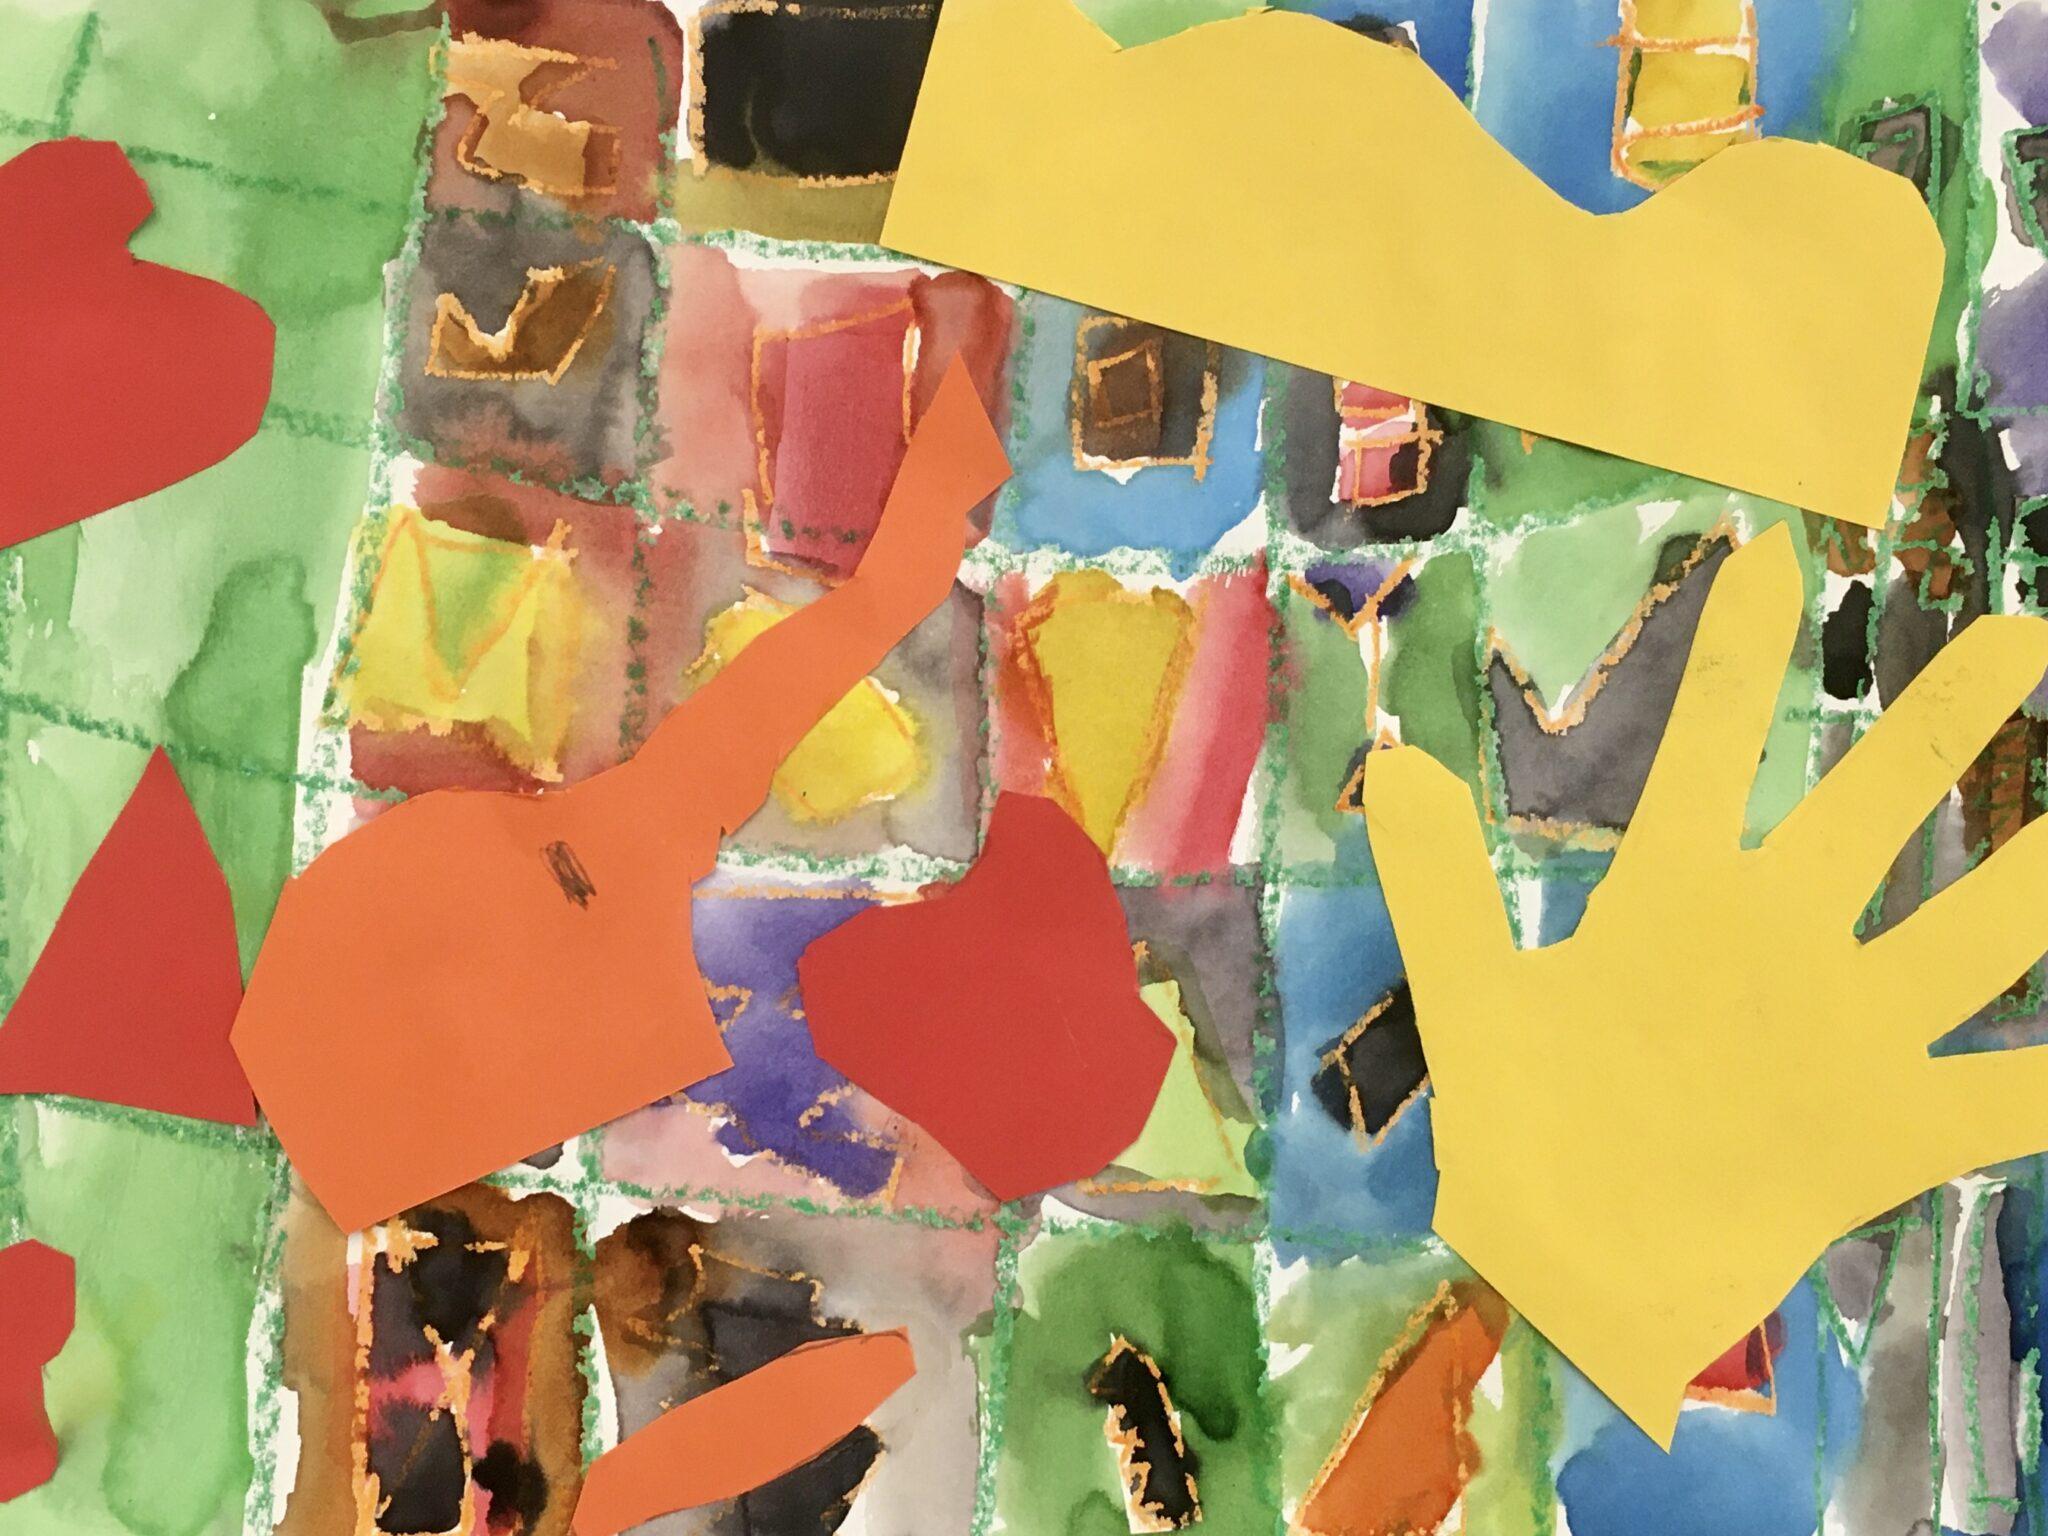 Paper collages artwork